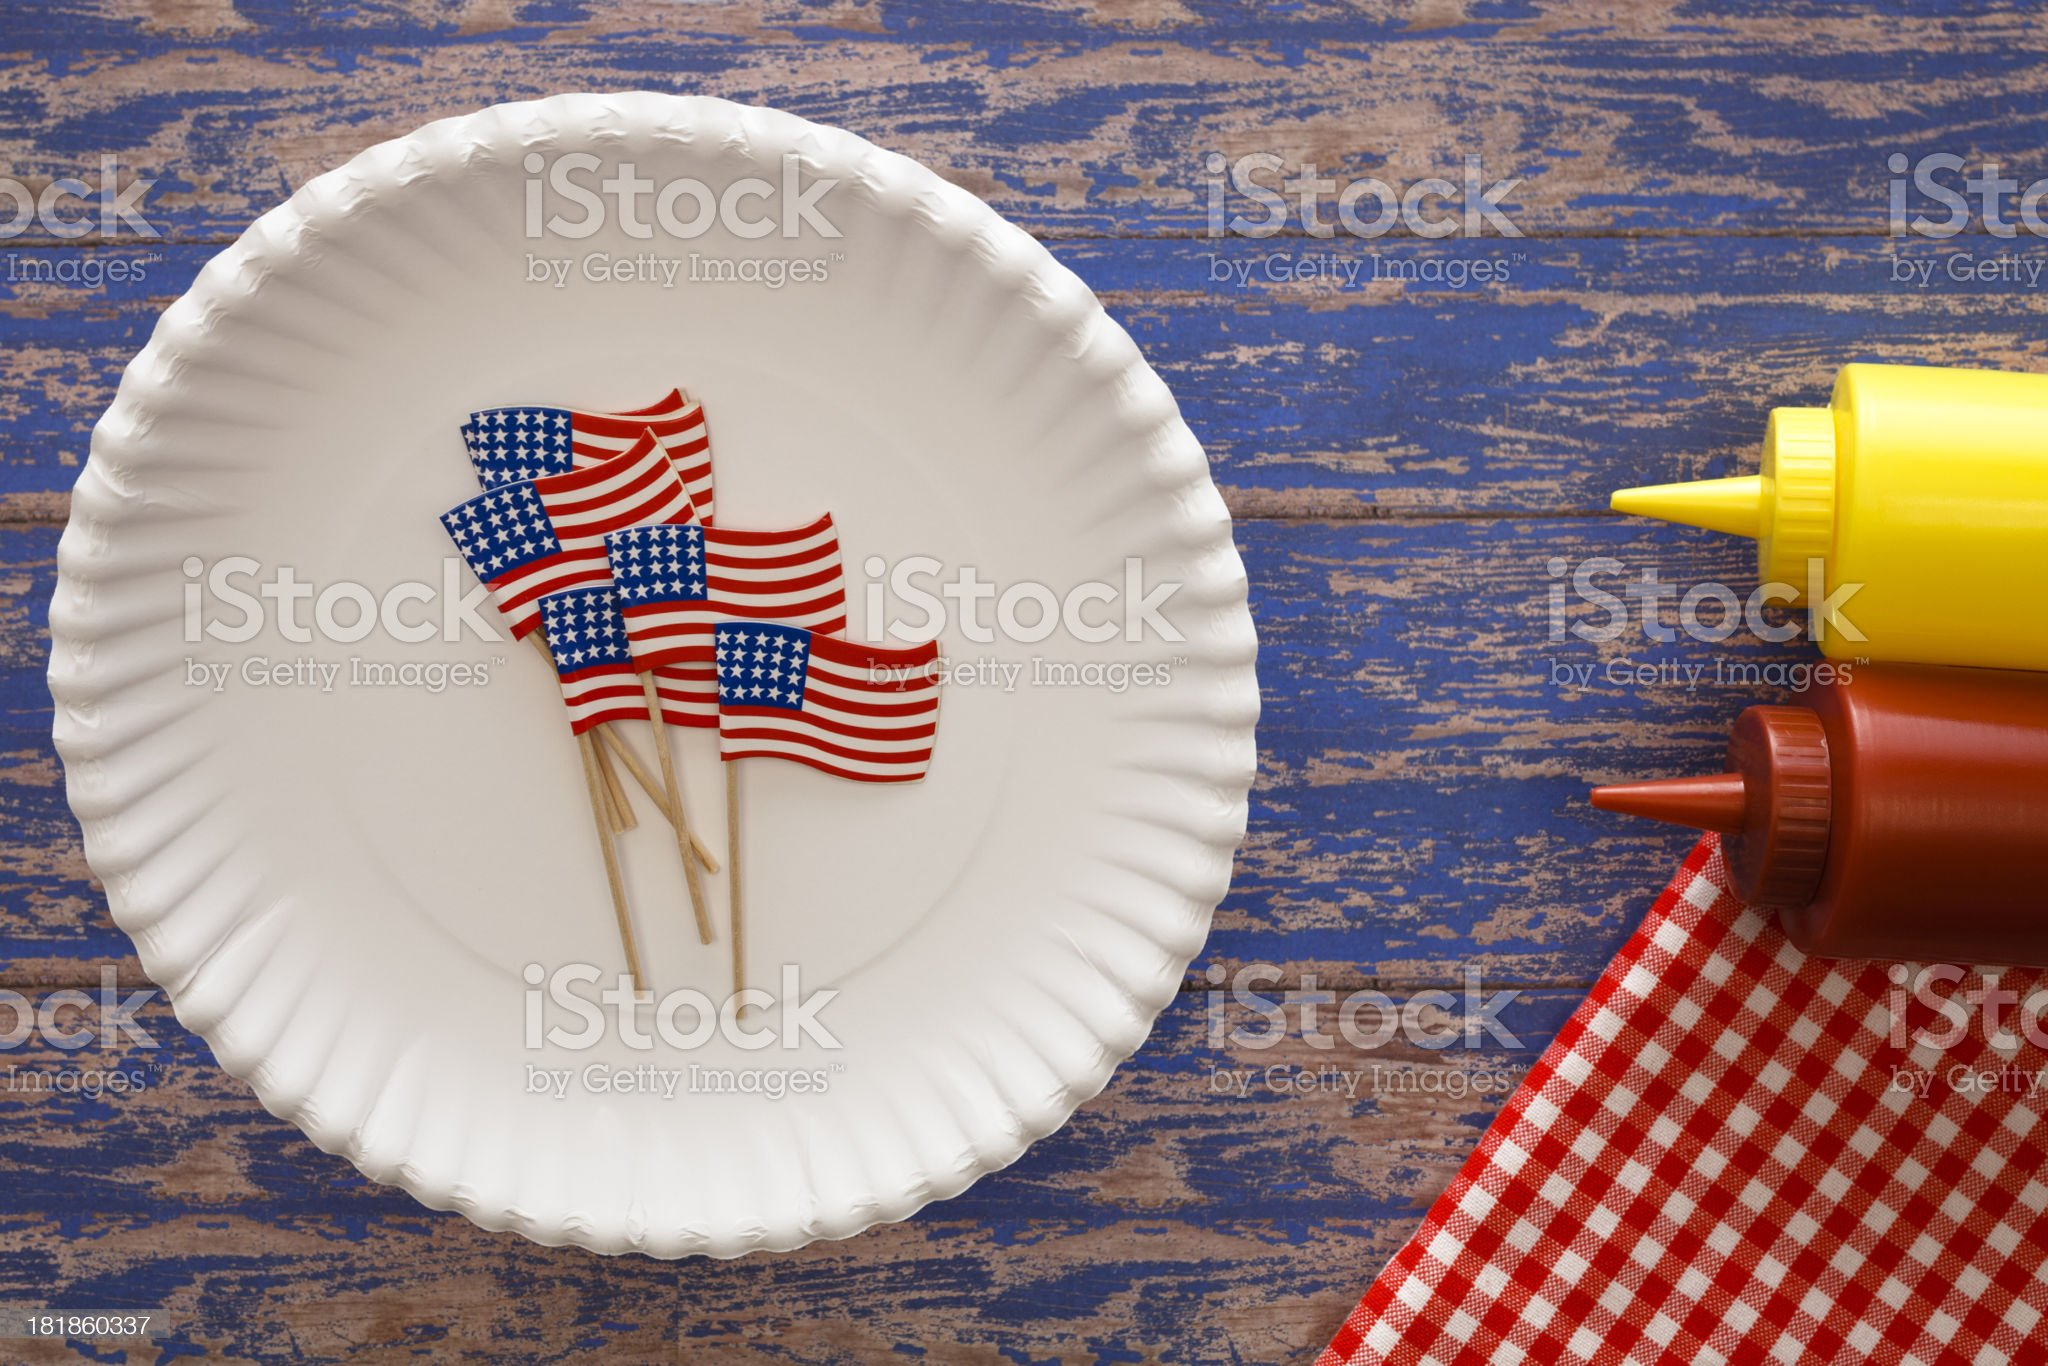 American Patriotic Setting royalty-free stock photo